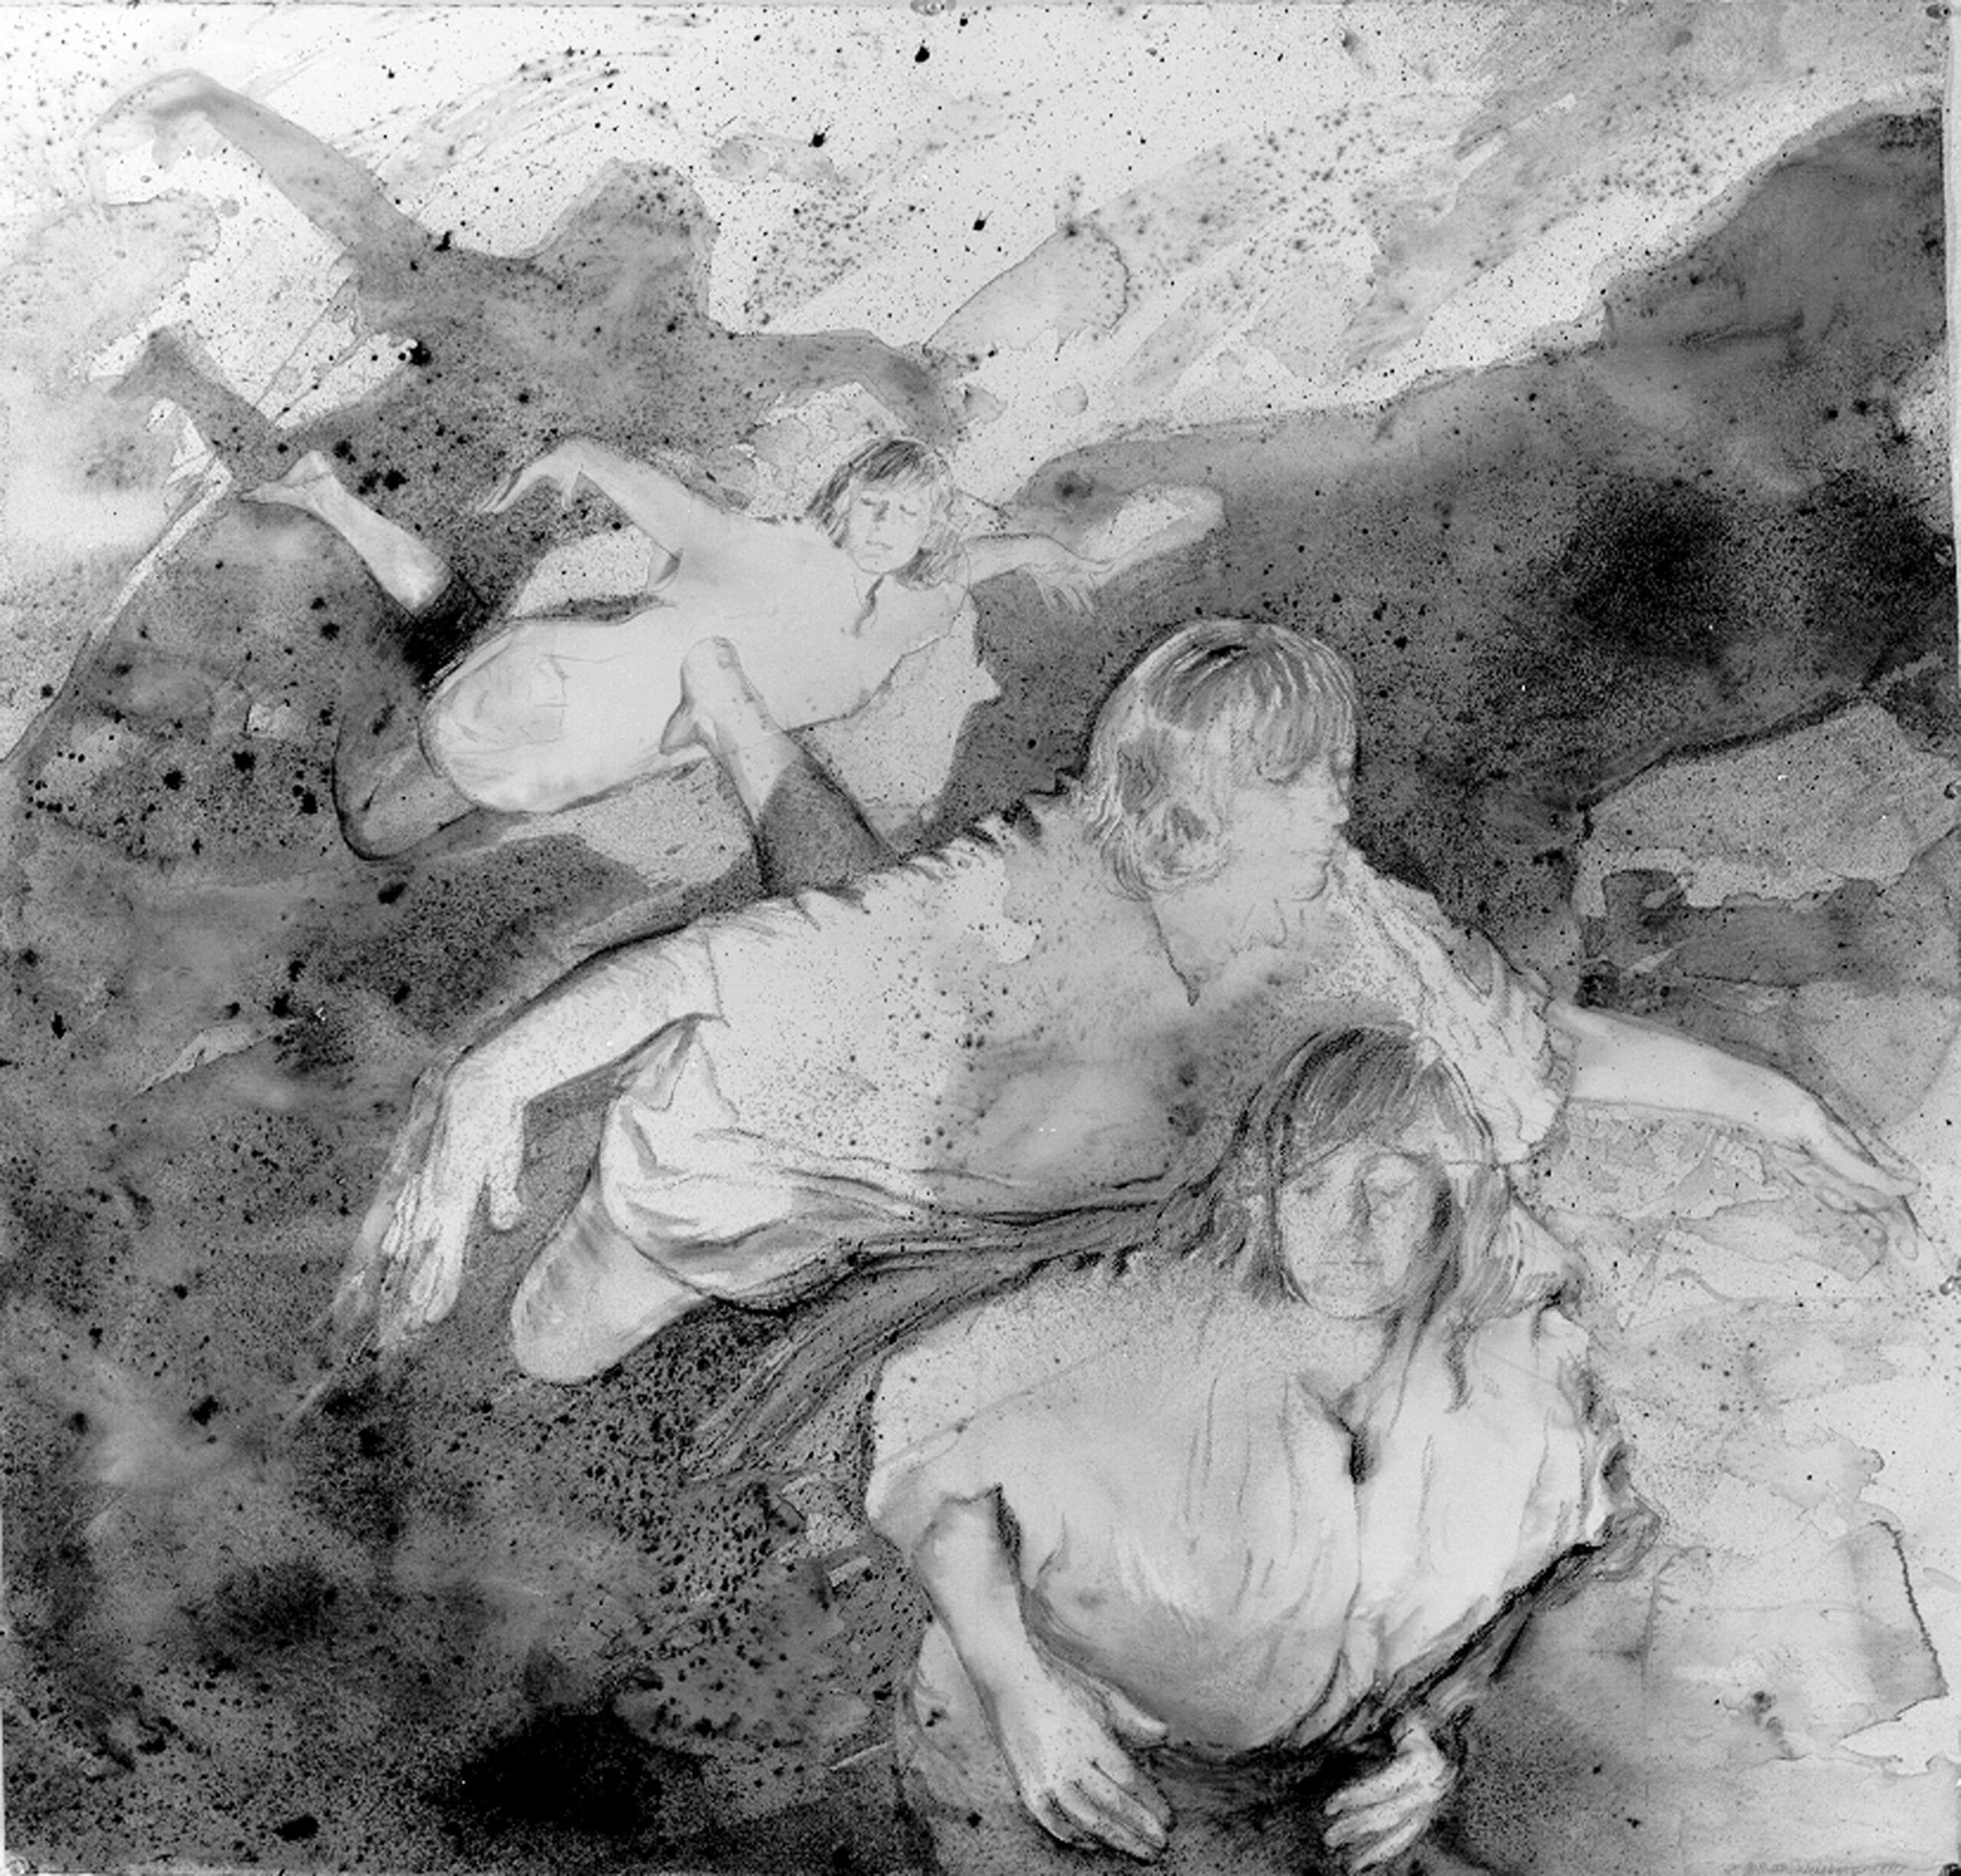 "Ruth Weisberg, Flying & Dreaming, mixed media, 45"" x 46"", 1990."